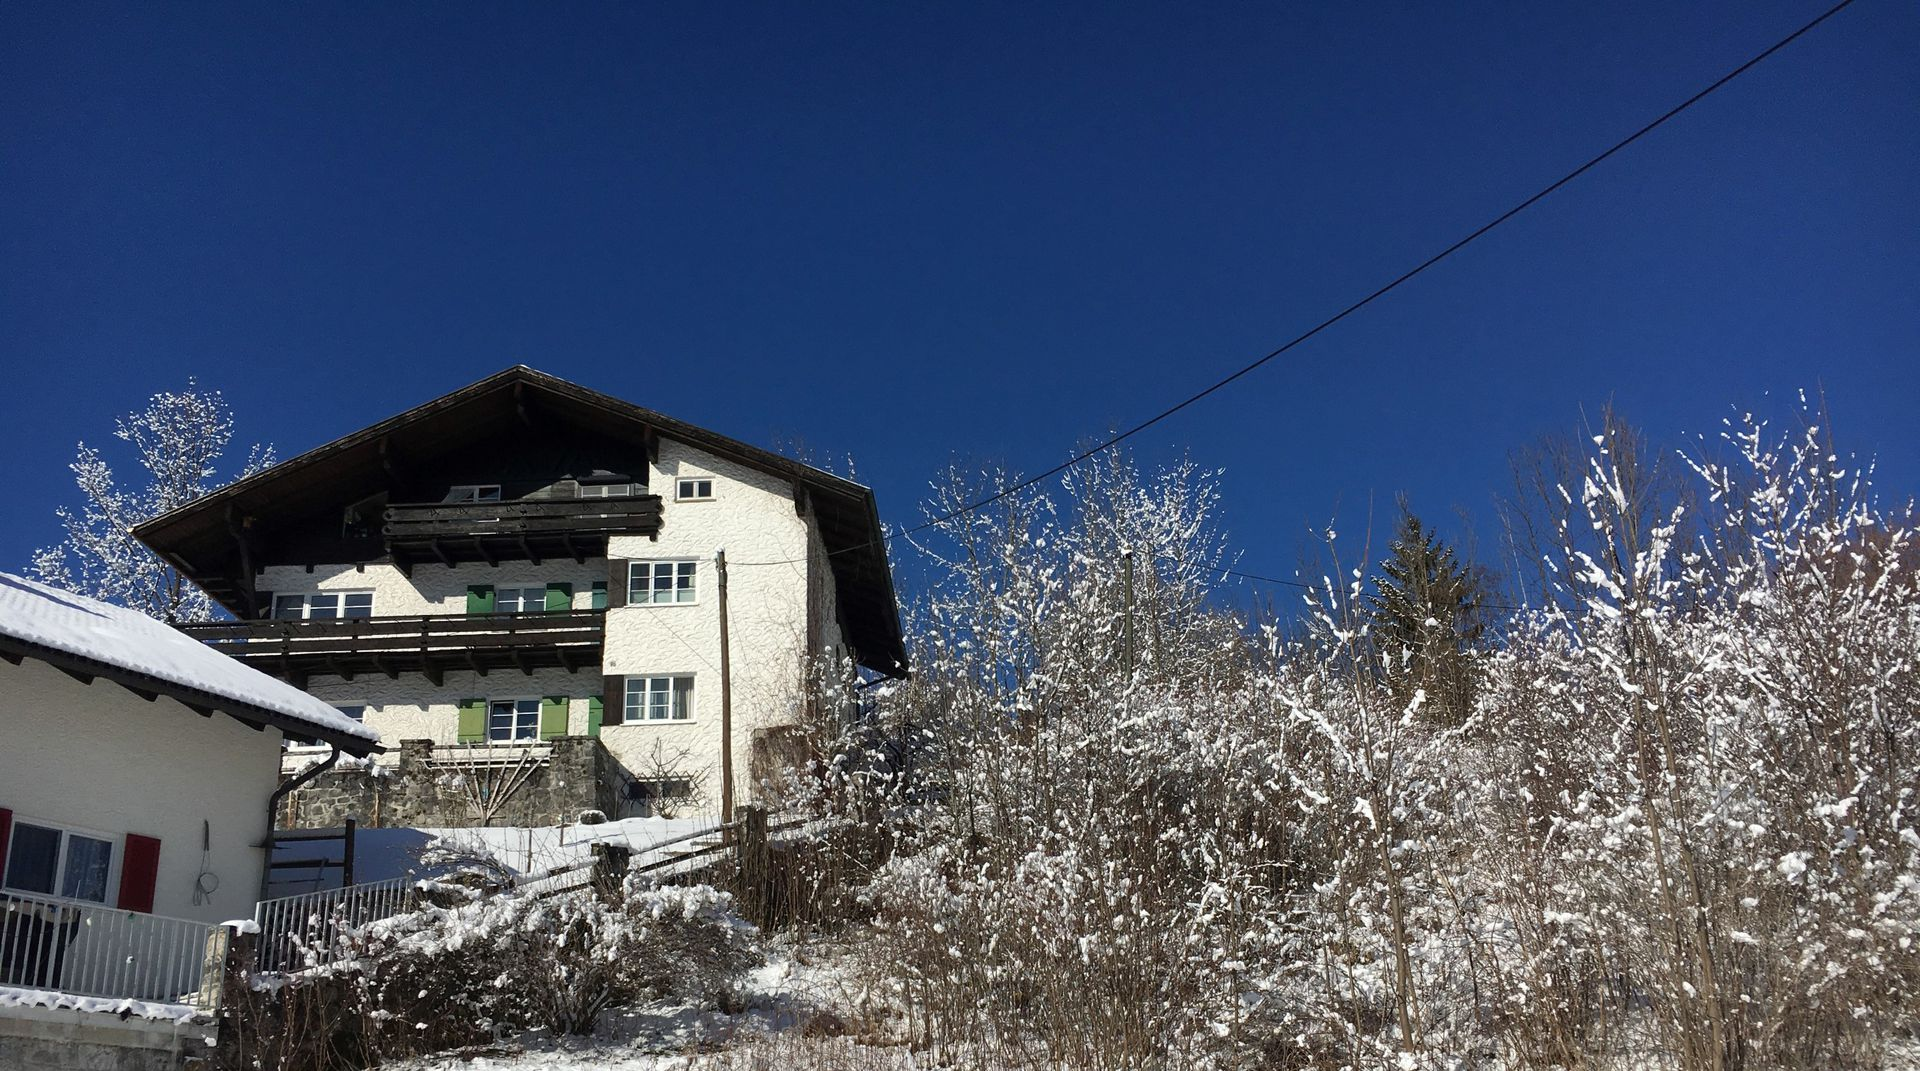 Appartement de vacances 6-Pers.-Appartement (ca. 82 m²), OV, Ferienwohnung Wolfsberg (2295863), Reutte, Reutte, Tyrol, Autriche, image 1